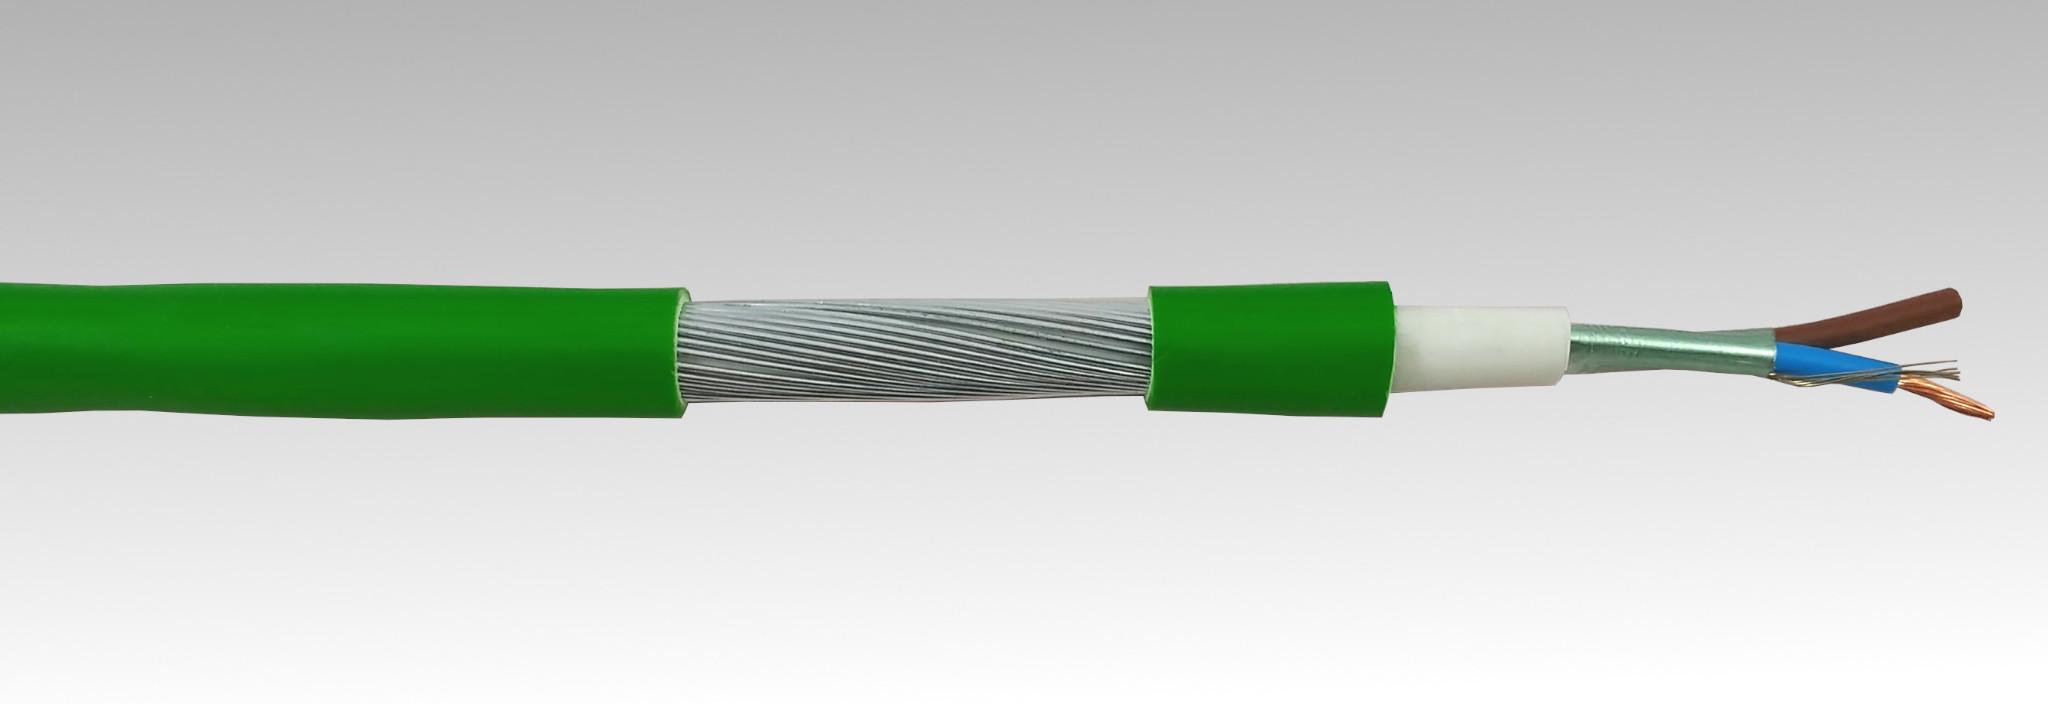 Brilliant Armoured Cable Cerviflam Roz1Mz1 K As 0 6 1 Kv Cervi Electrical Wiring 101 Photwellnesstrialsorg